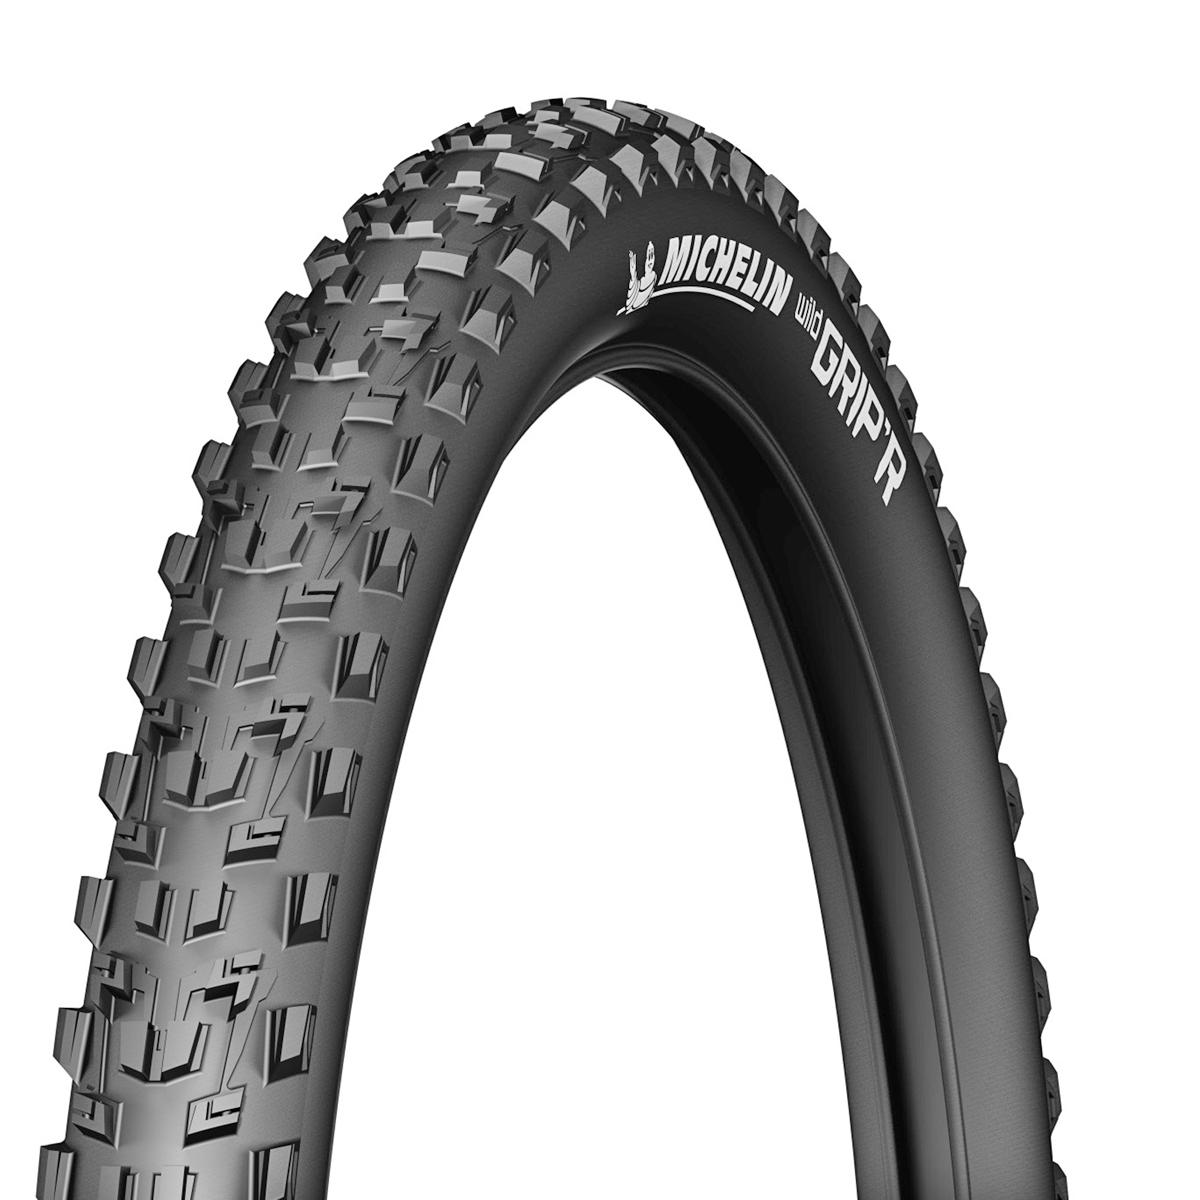 Pneu 26 x 2.10 Michelin Wild Grip'R (TS - TLR)